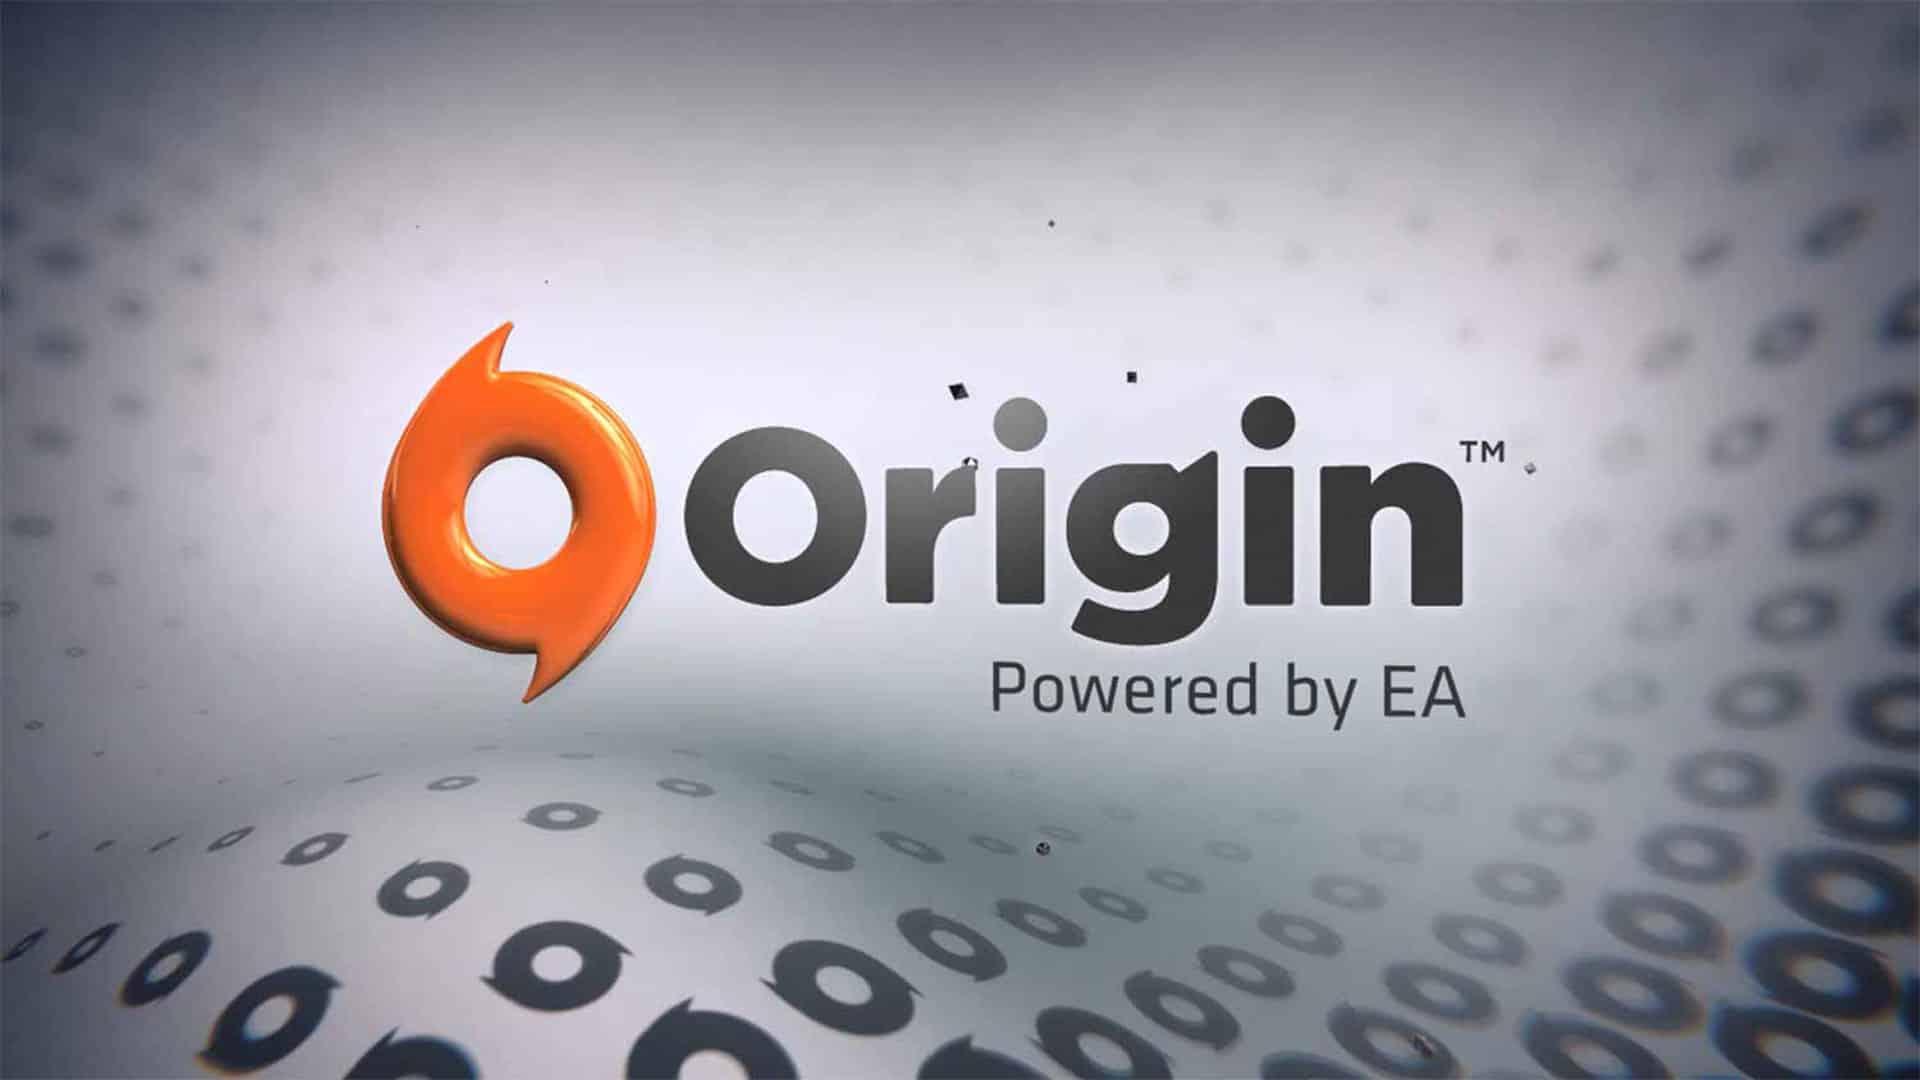 Origin regala due espansioni per Battefield 4 e Hardline